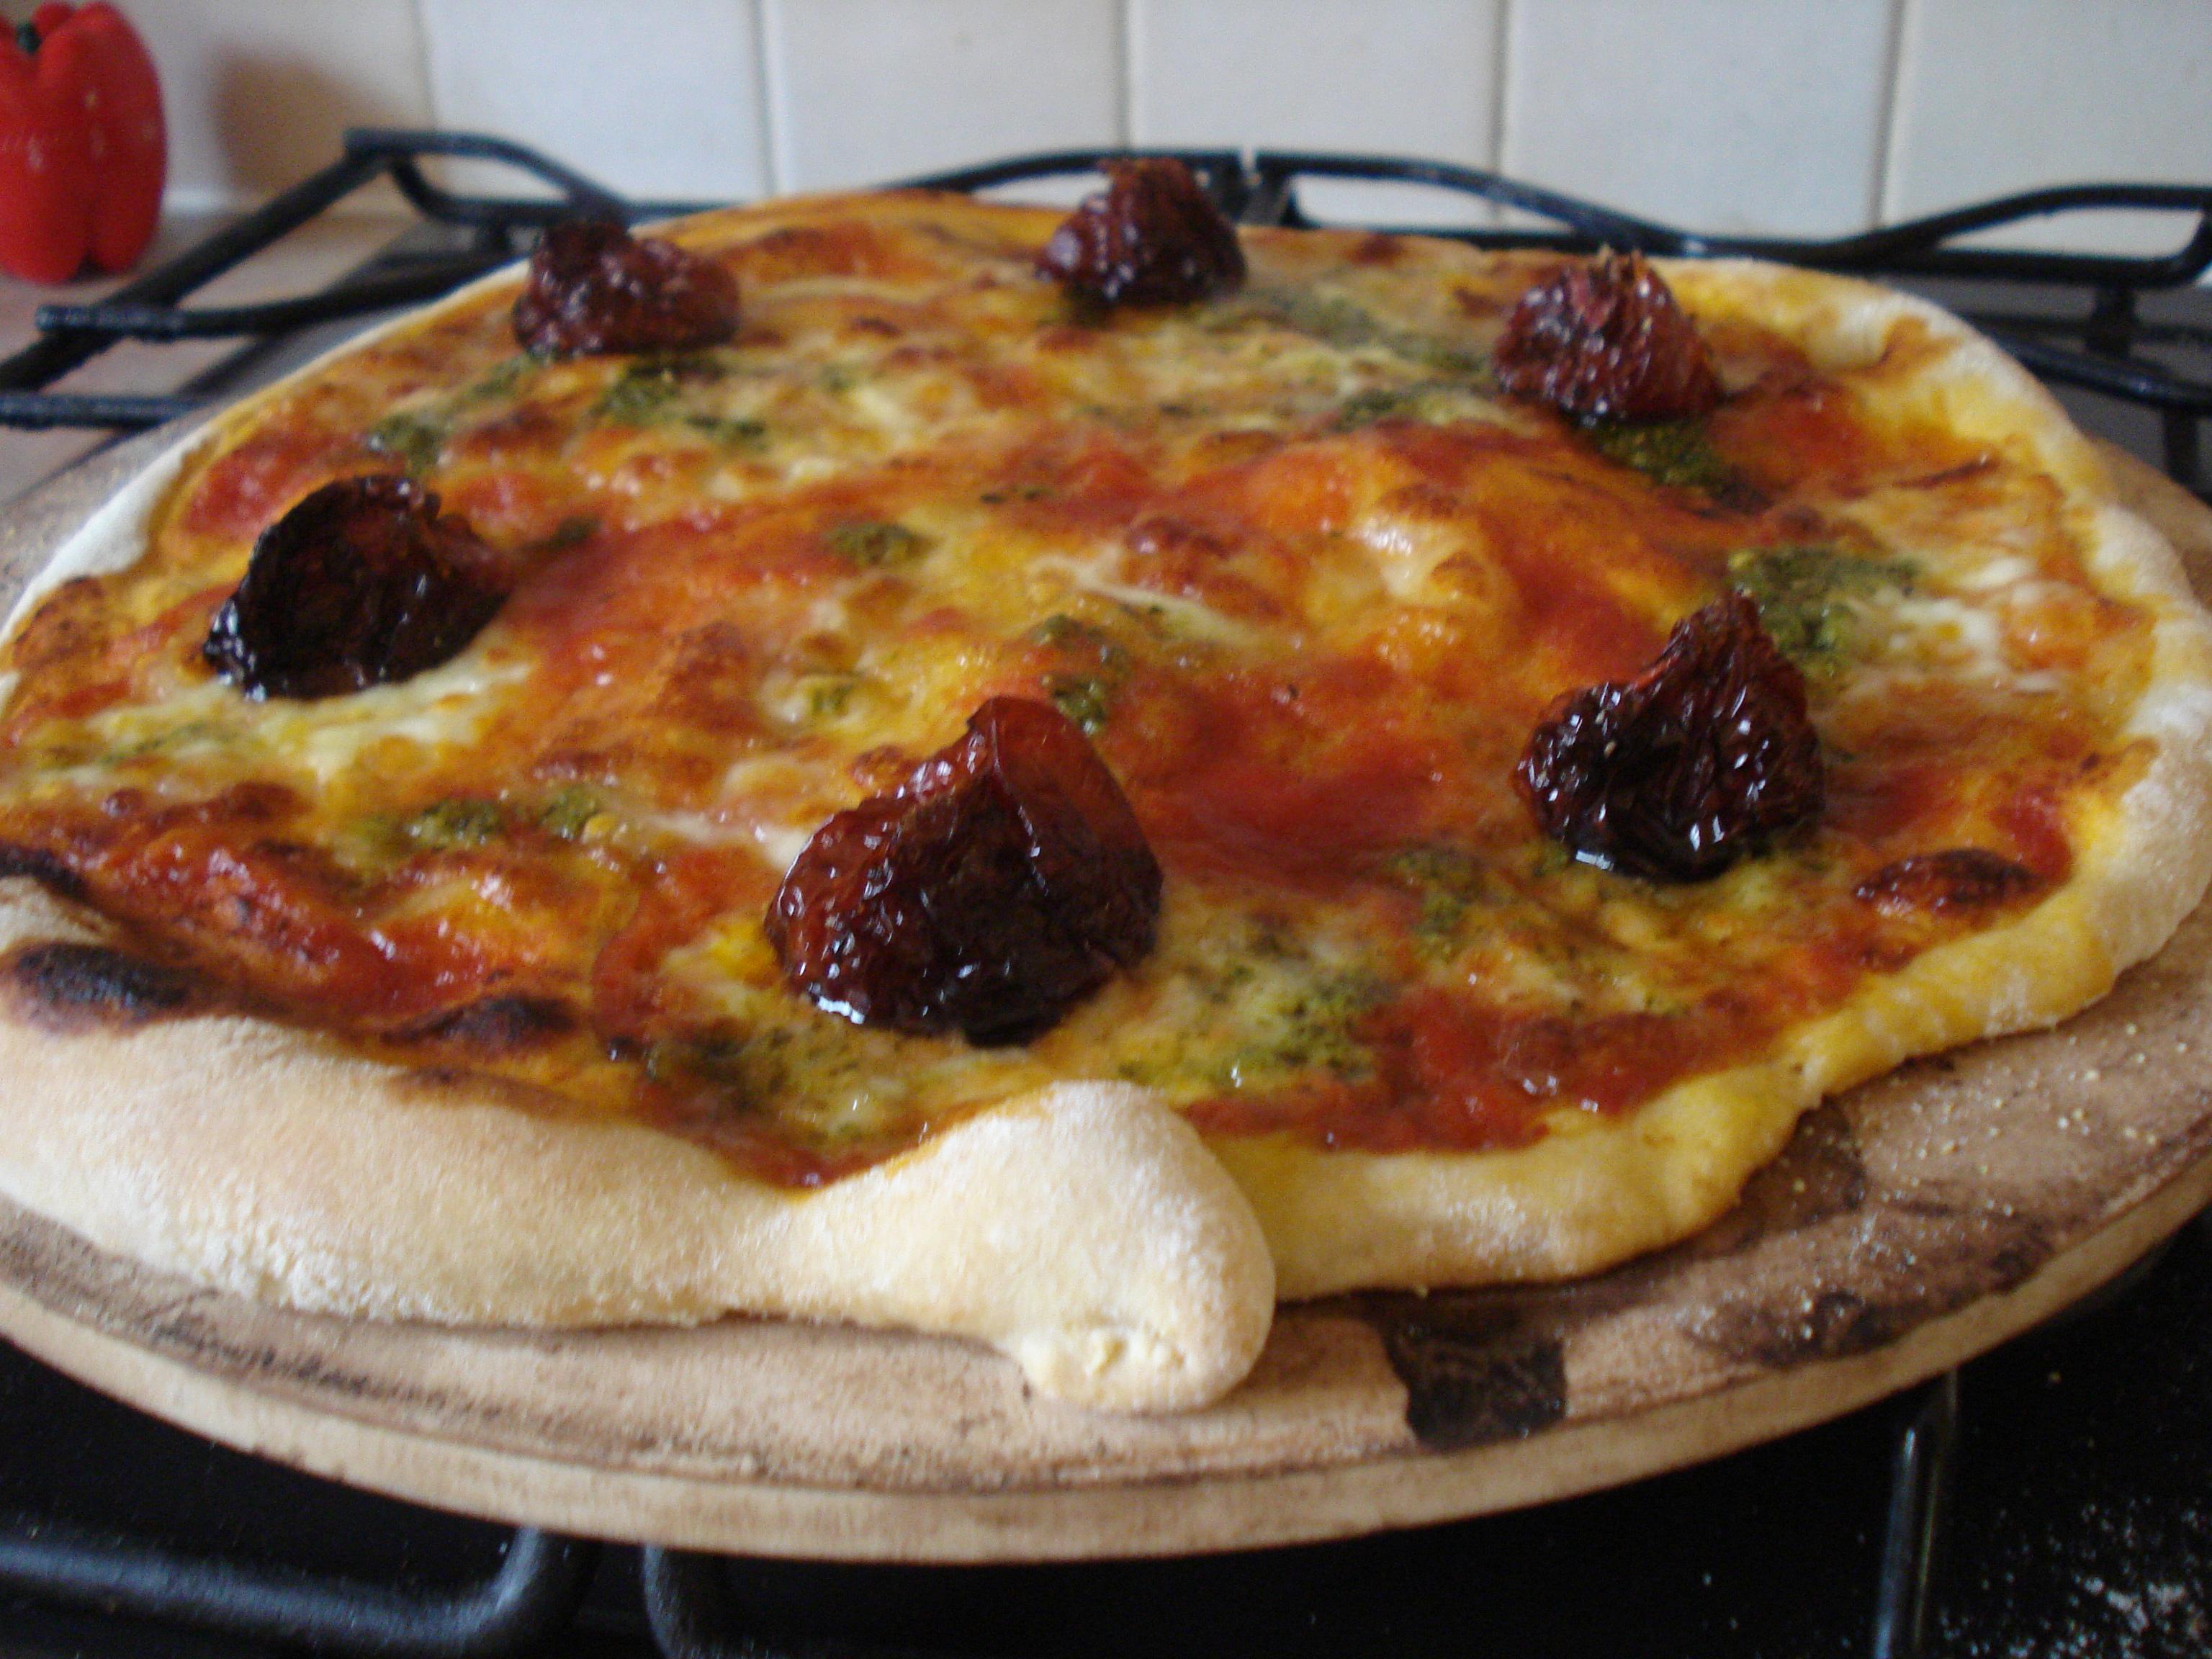 slow-roast tomato and pesto pizza